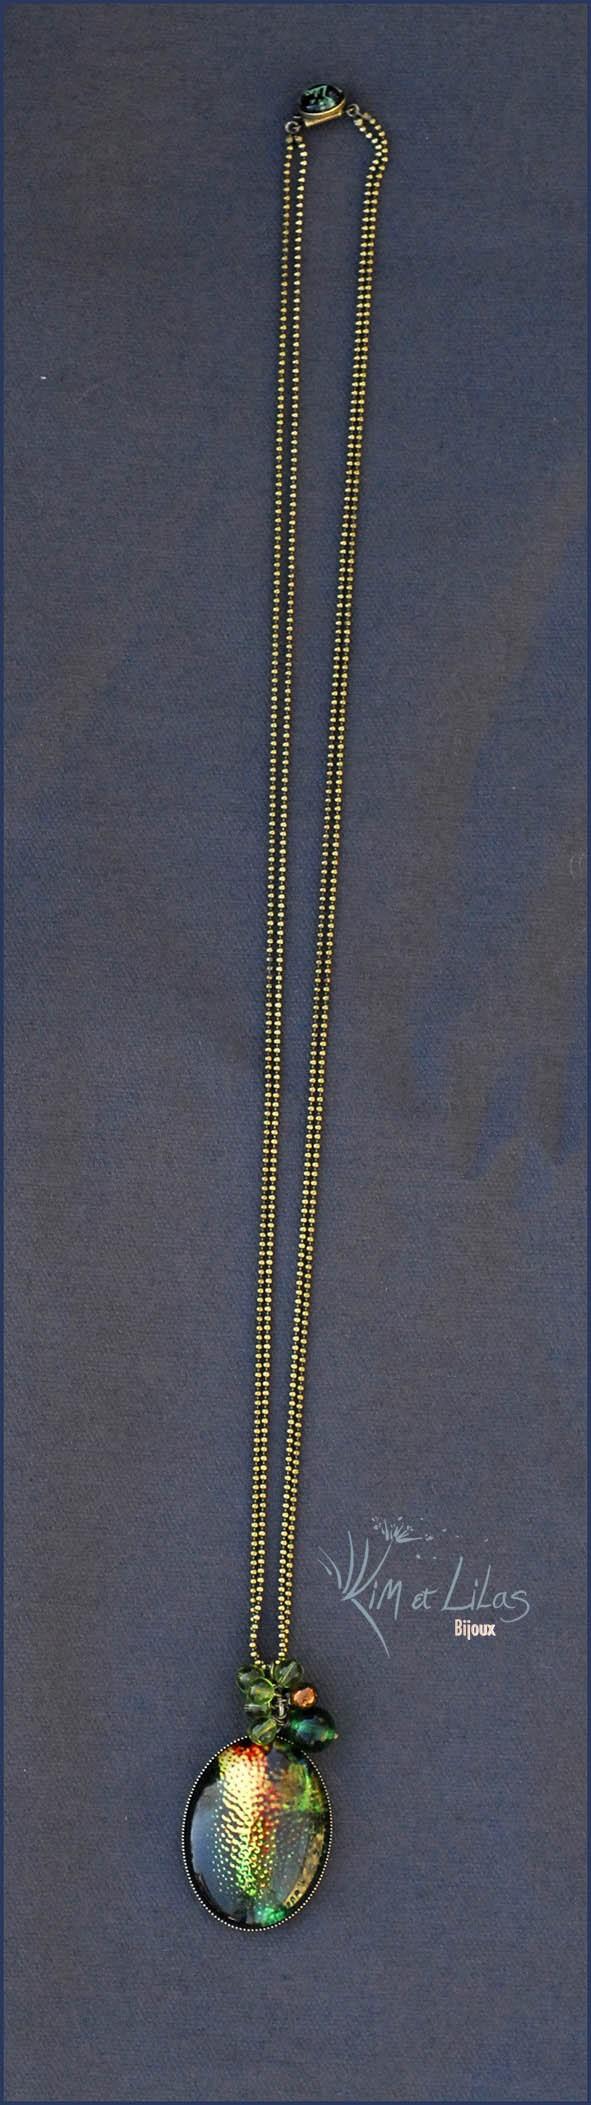 Collier long Naturalia Insecte bijou